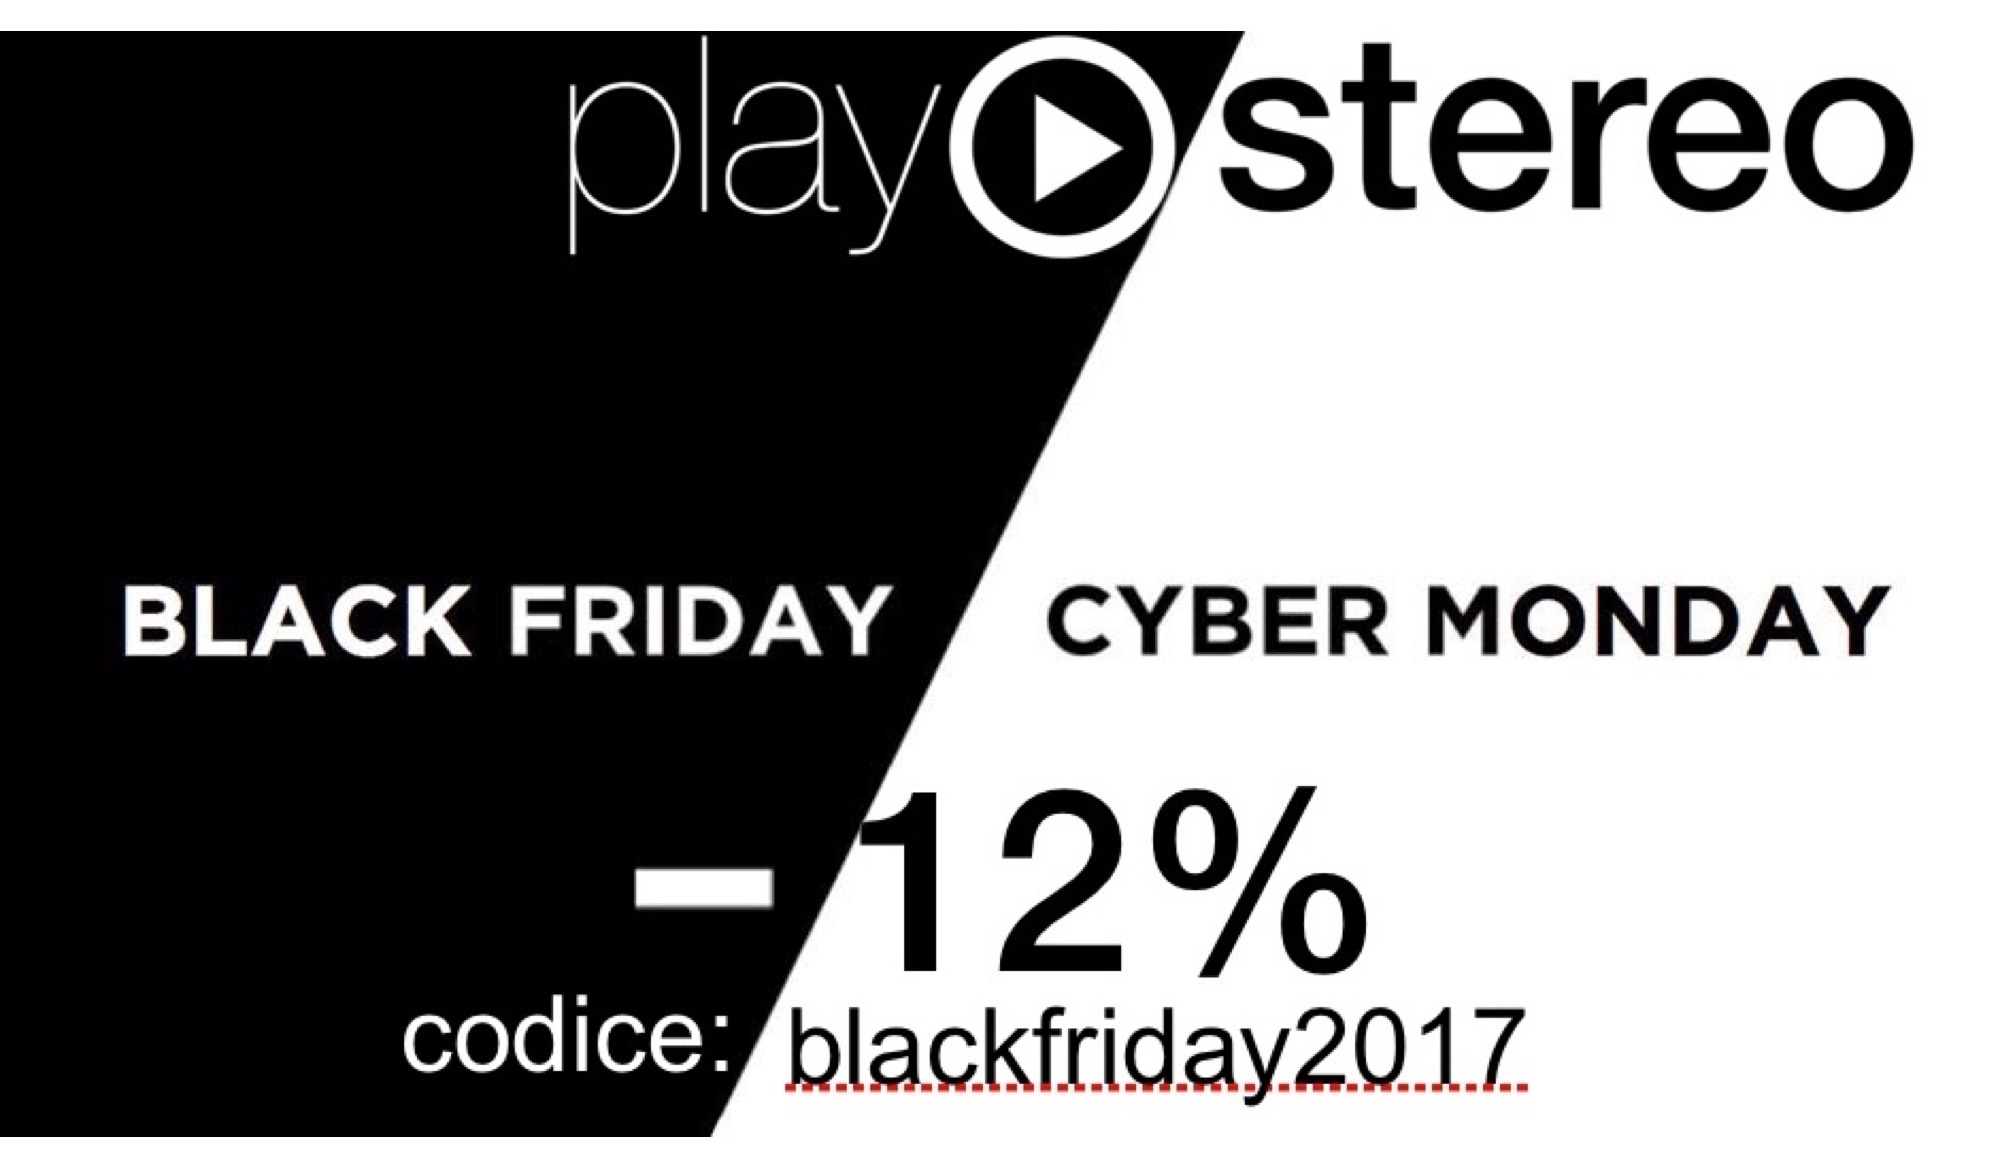 2017 Black Friday / Cyber Monday